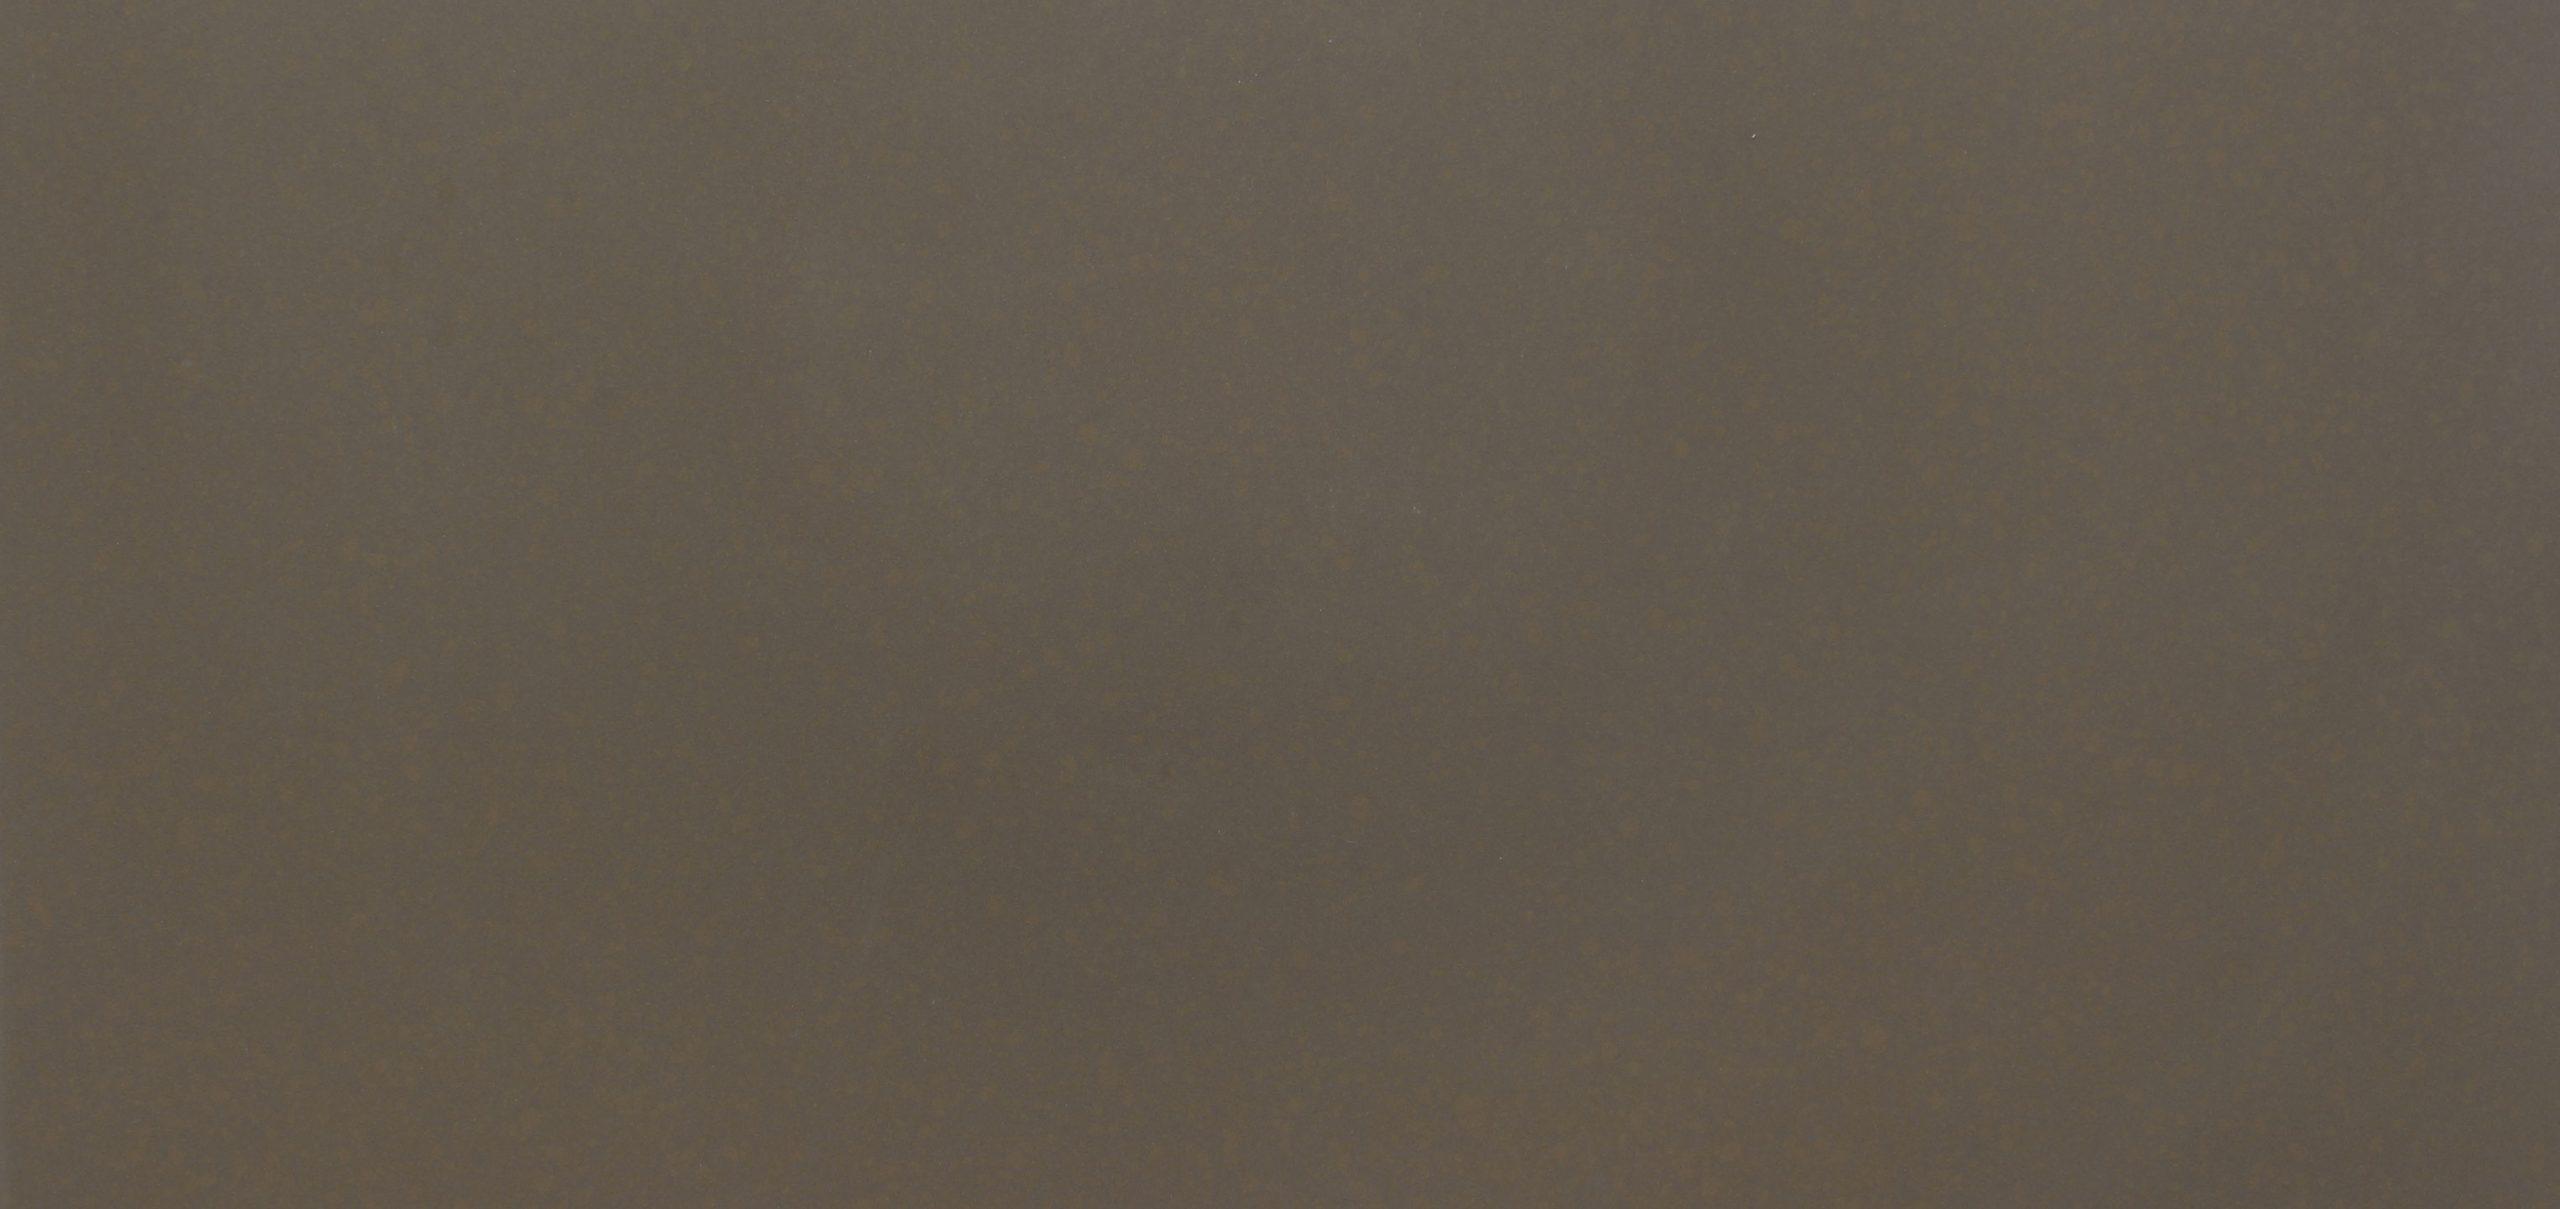 Vicostone Luna Sand BS120 02